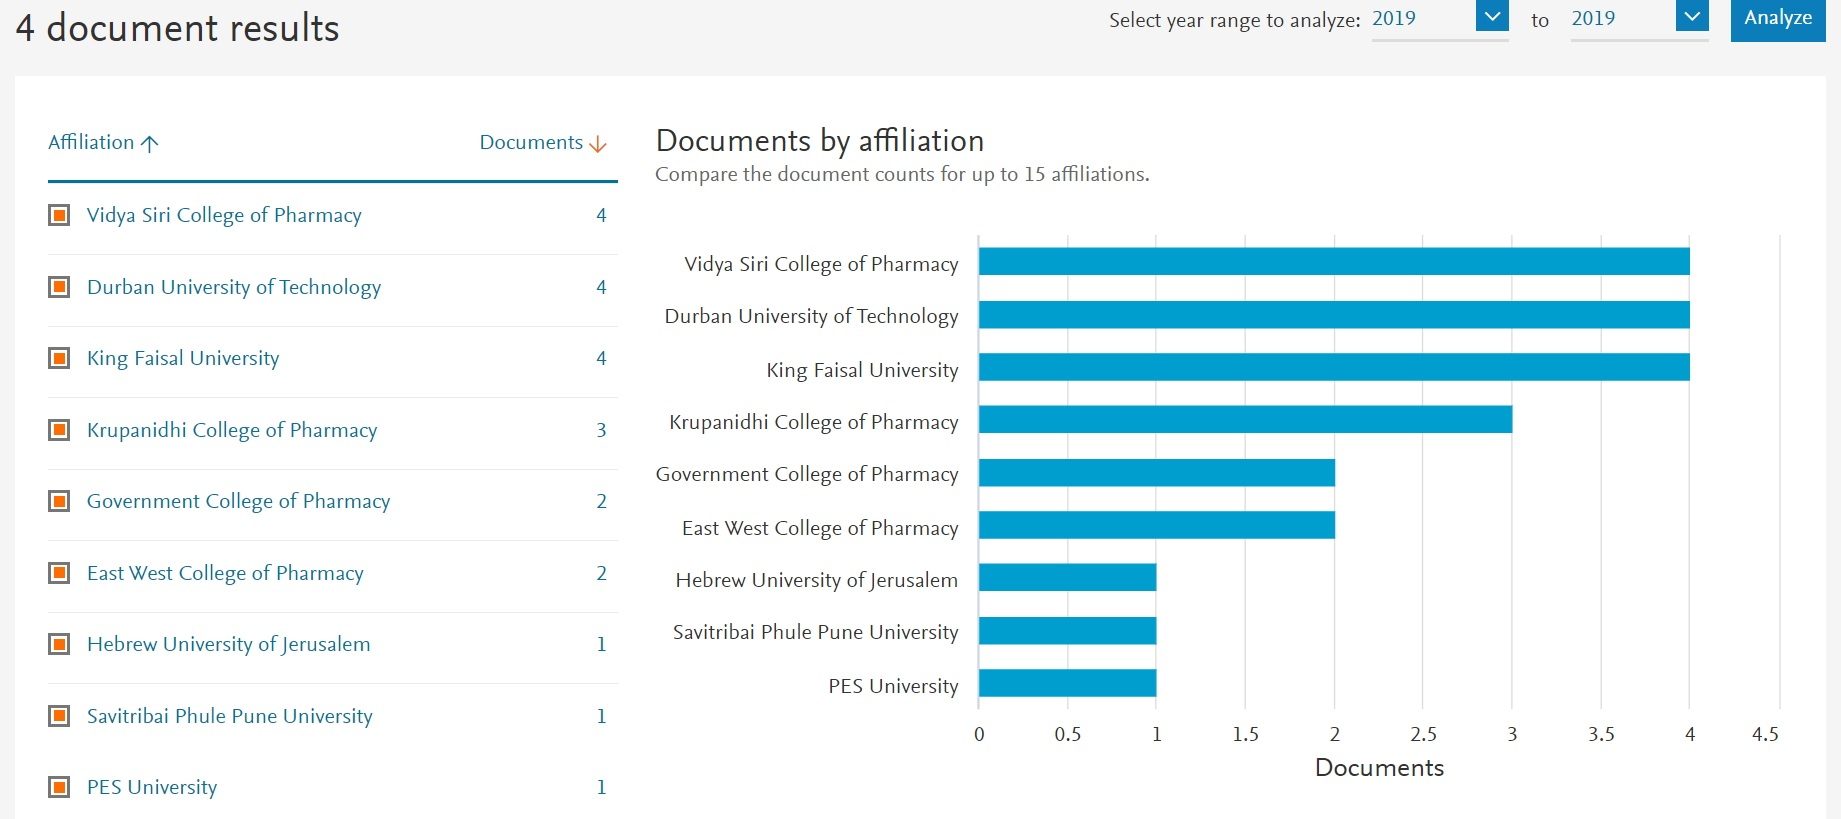 Vidya Siri College of Pharmacy Collaboration